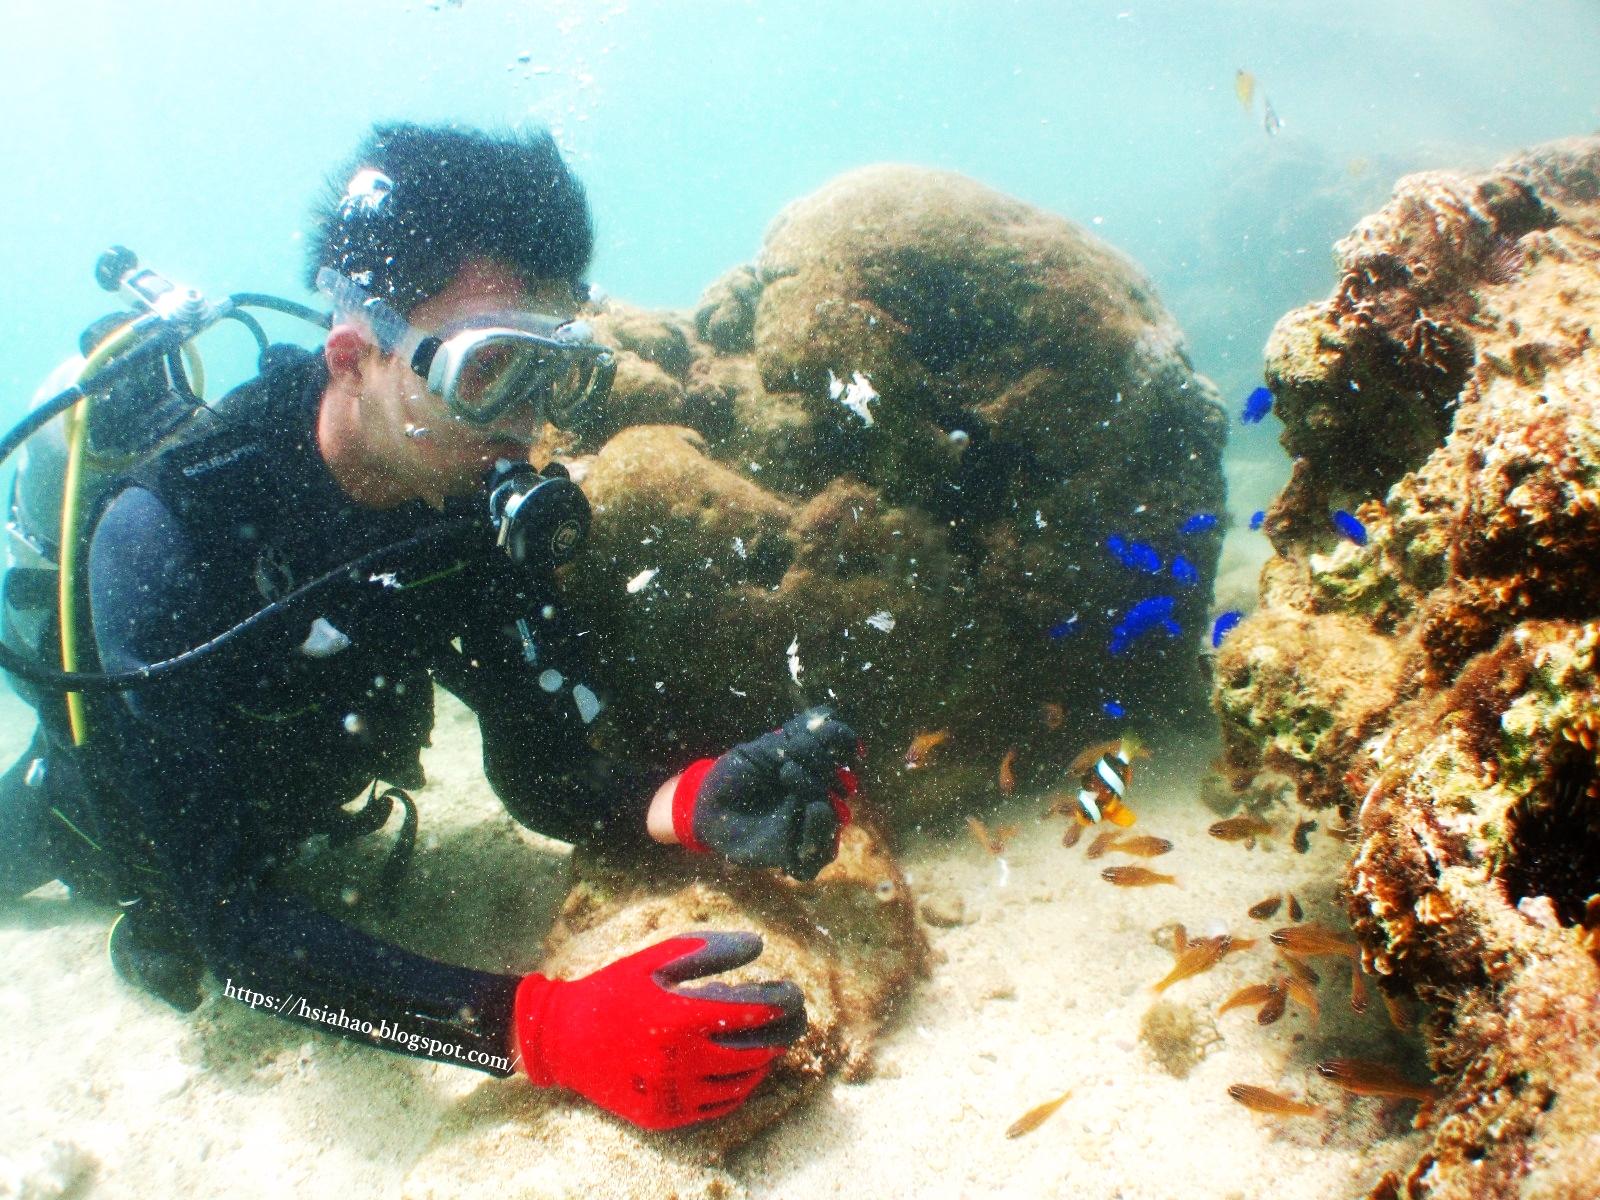 沖繩-景點-推薦-青之洞窟-潛水-浮潛-青の洞窟-自由行-旅遊-Okinawa-diving-snorkeling-maeda-cape-blue-cave